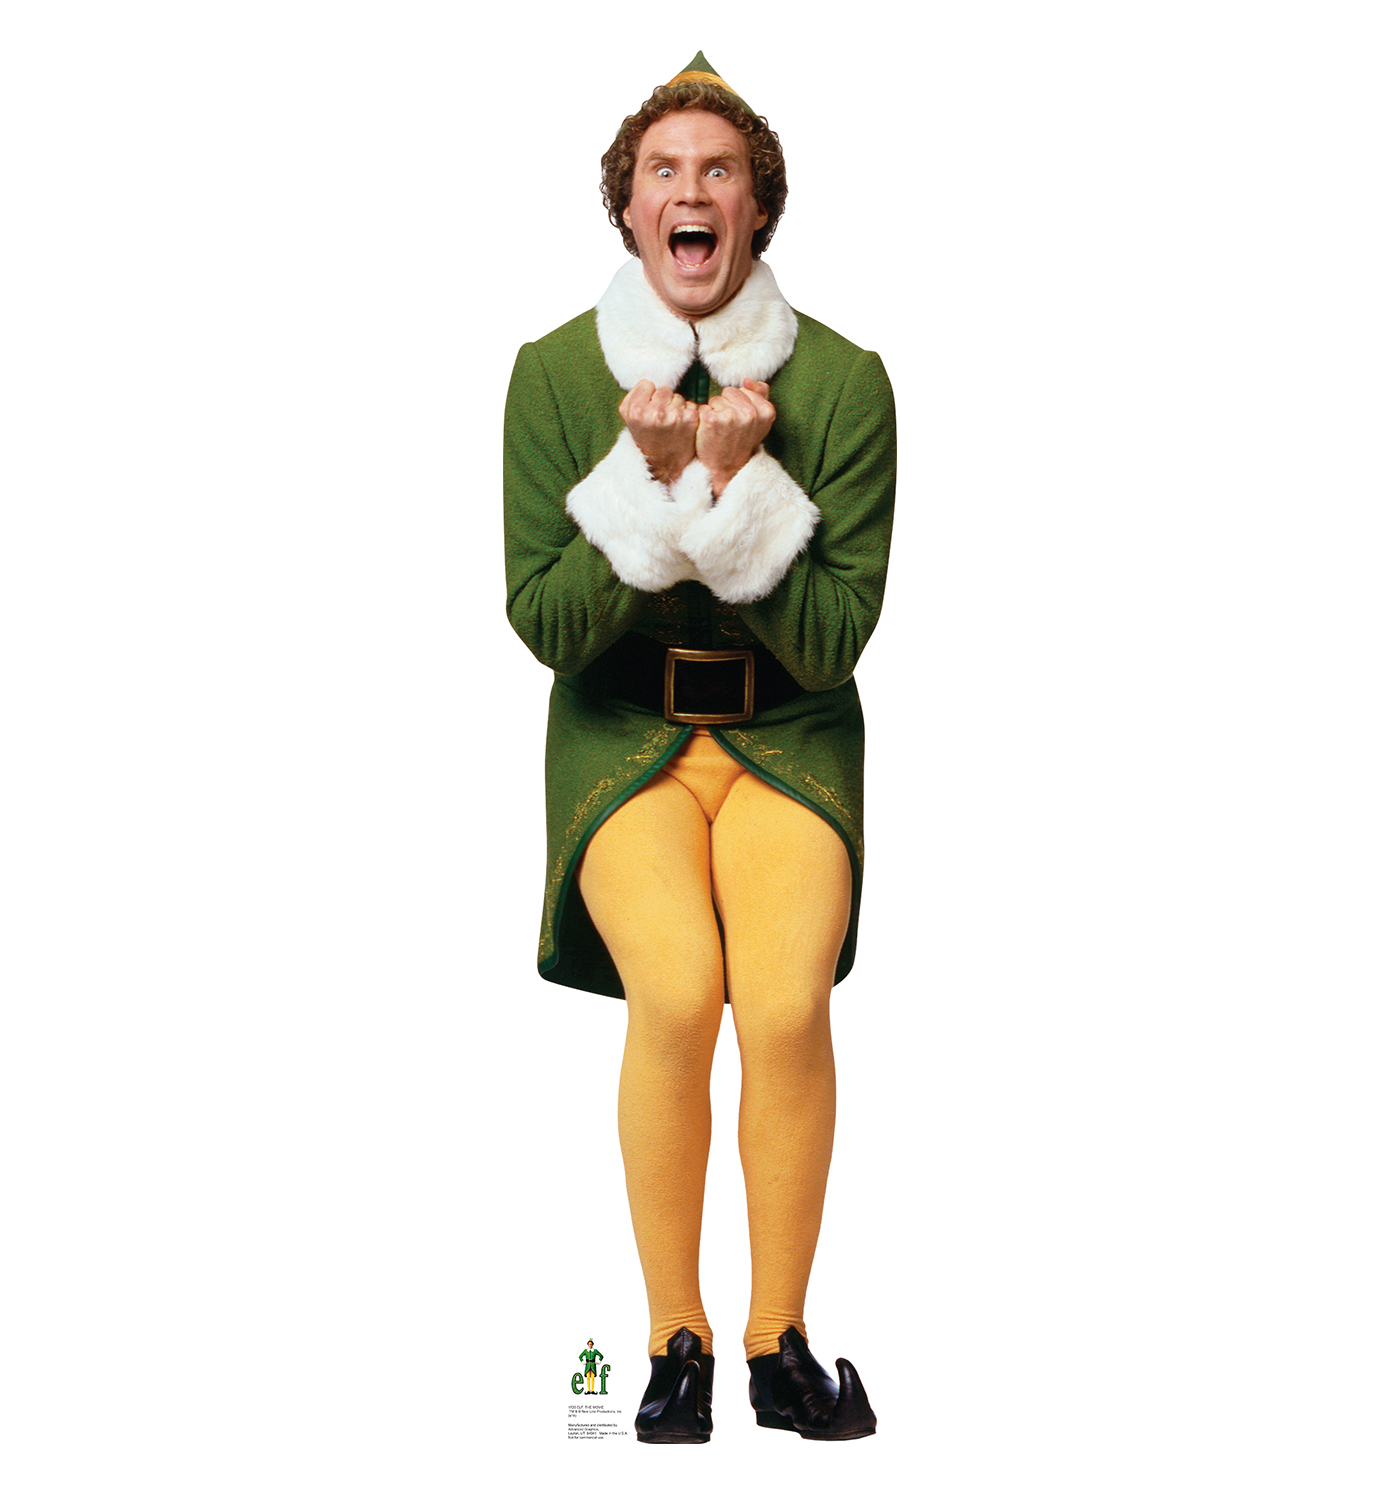 Buddy The Elf Clipart - Clipart Kid